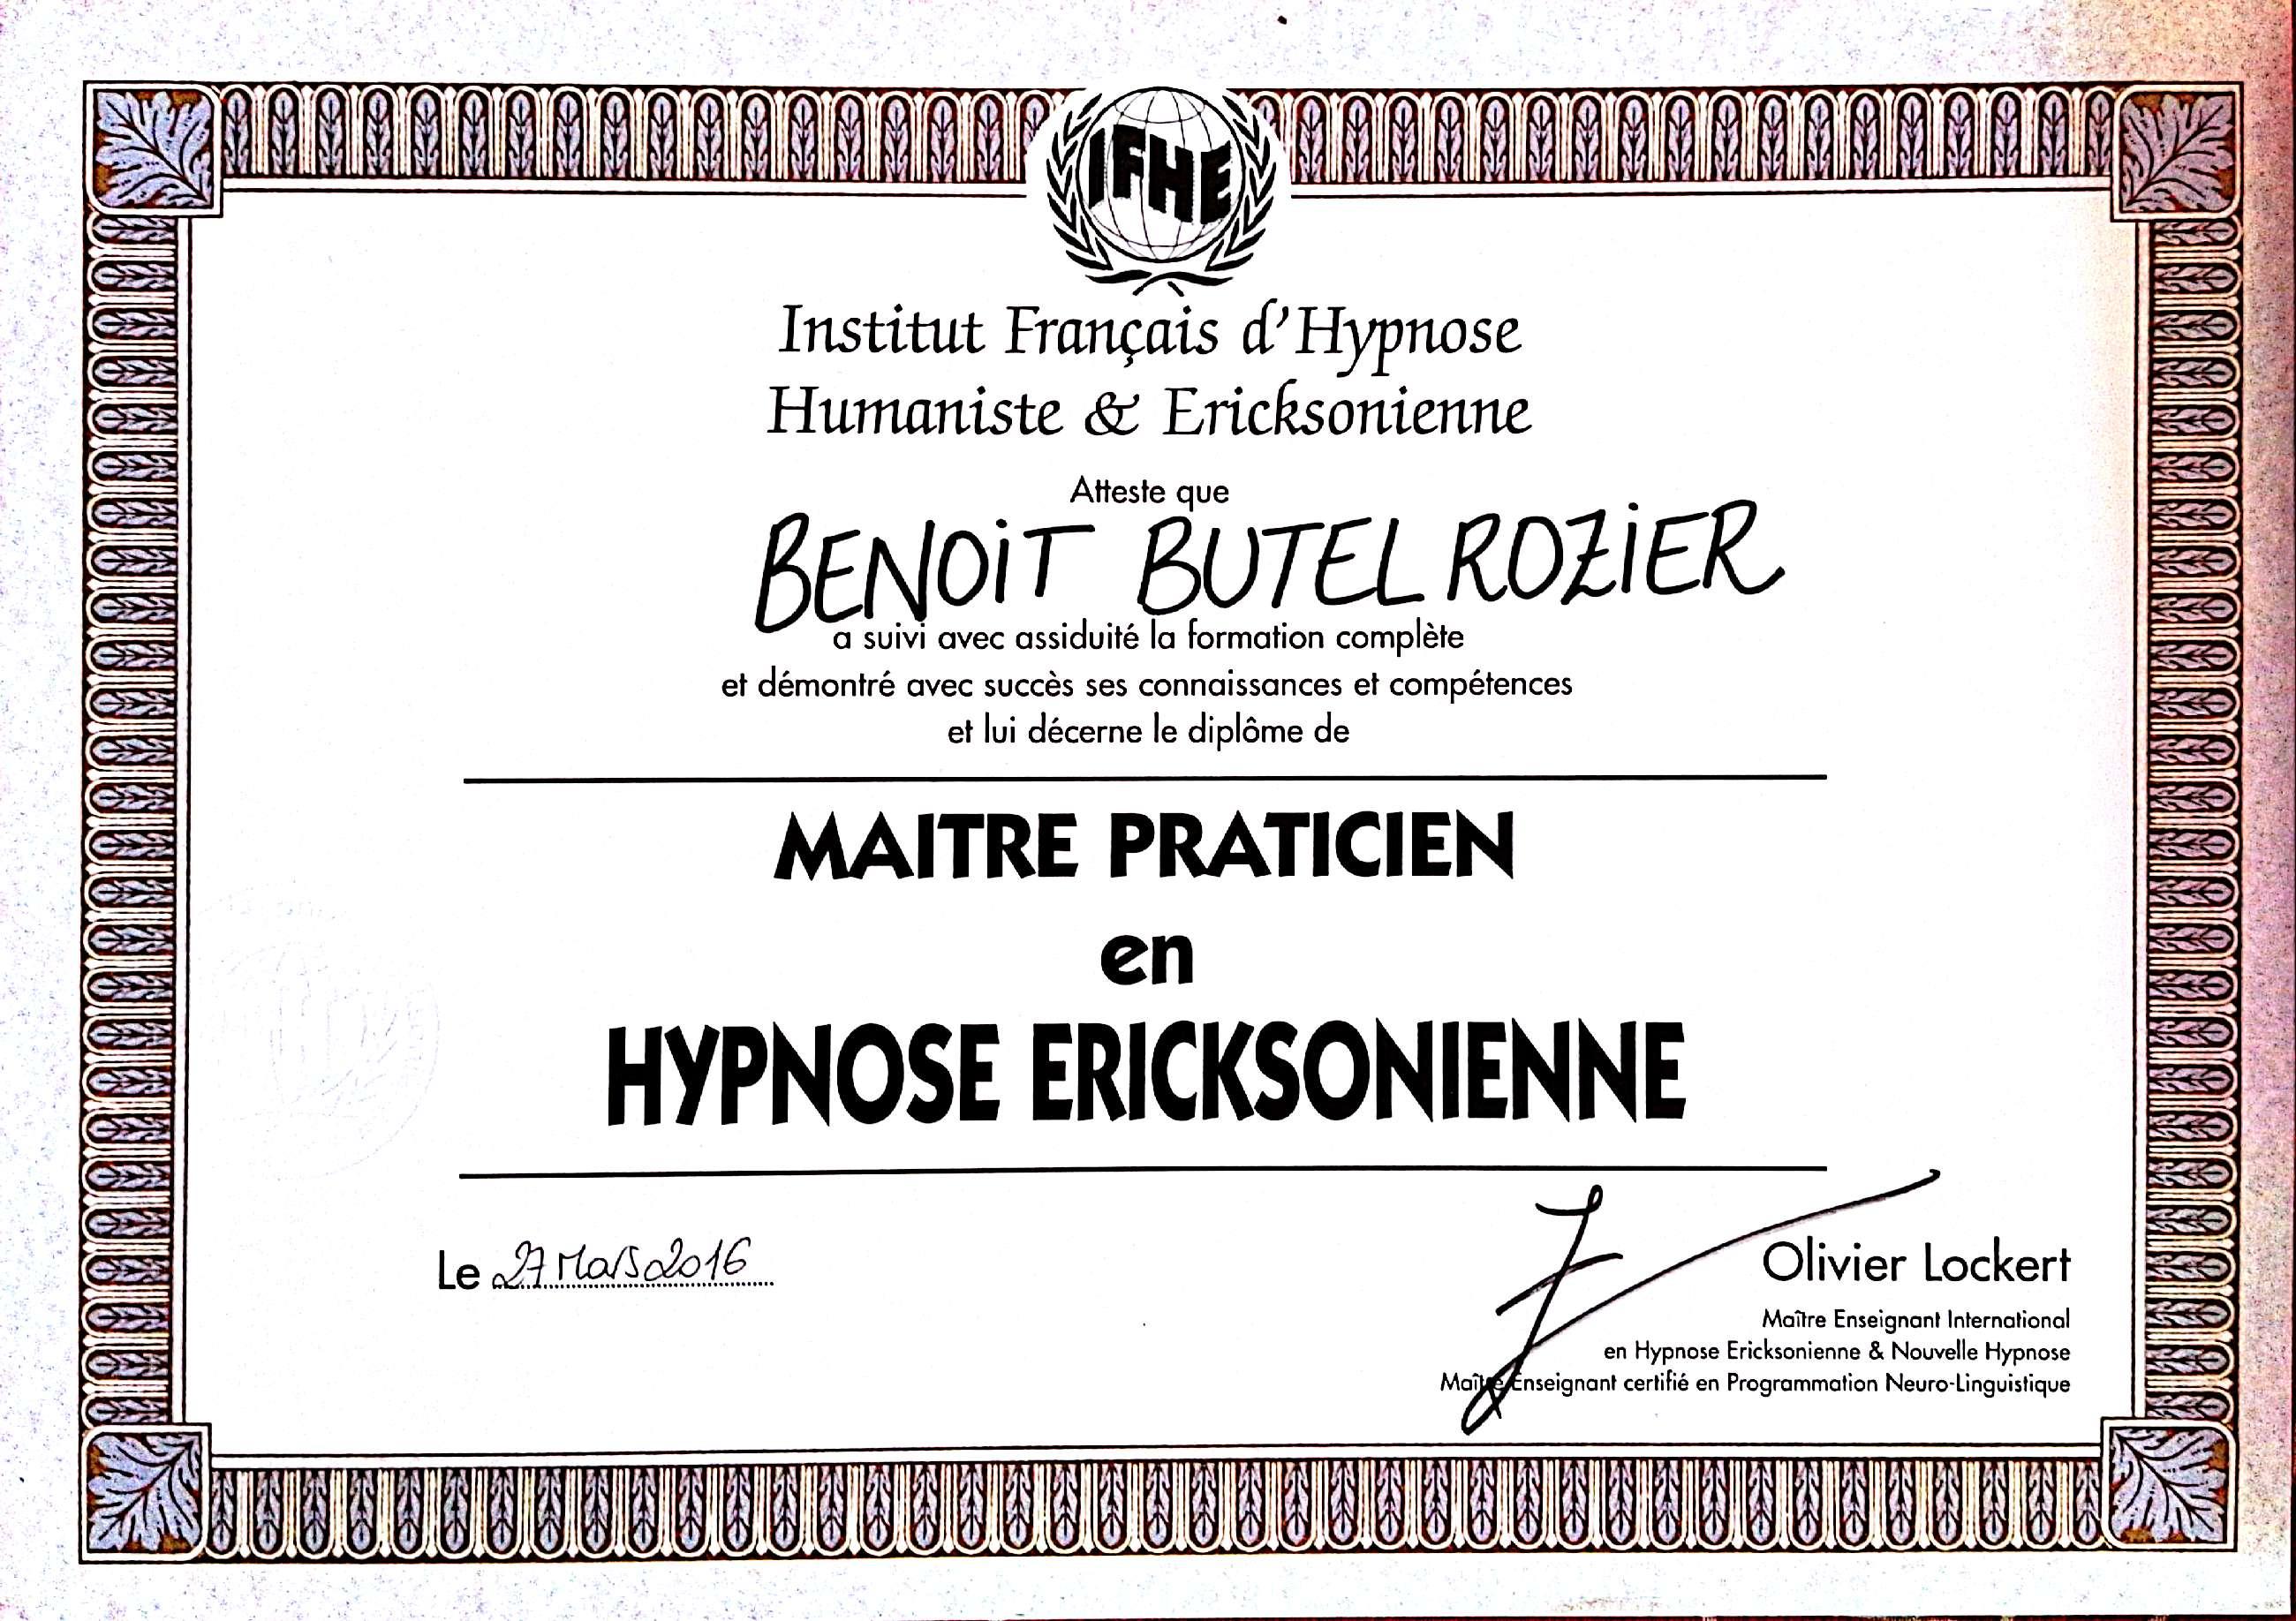 Maître Praticien Hypnoses Hypnose Ericksonienne